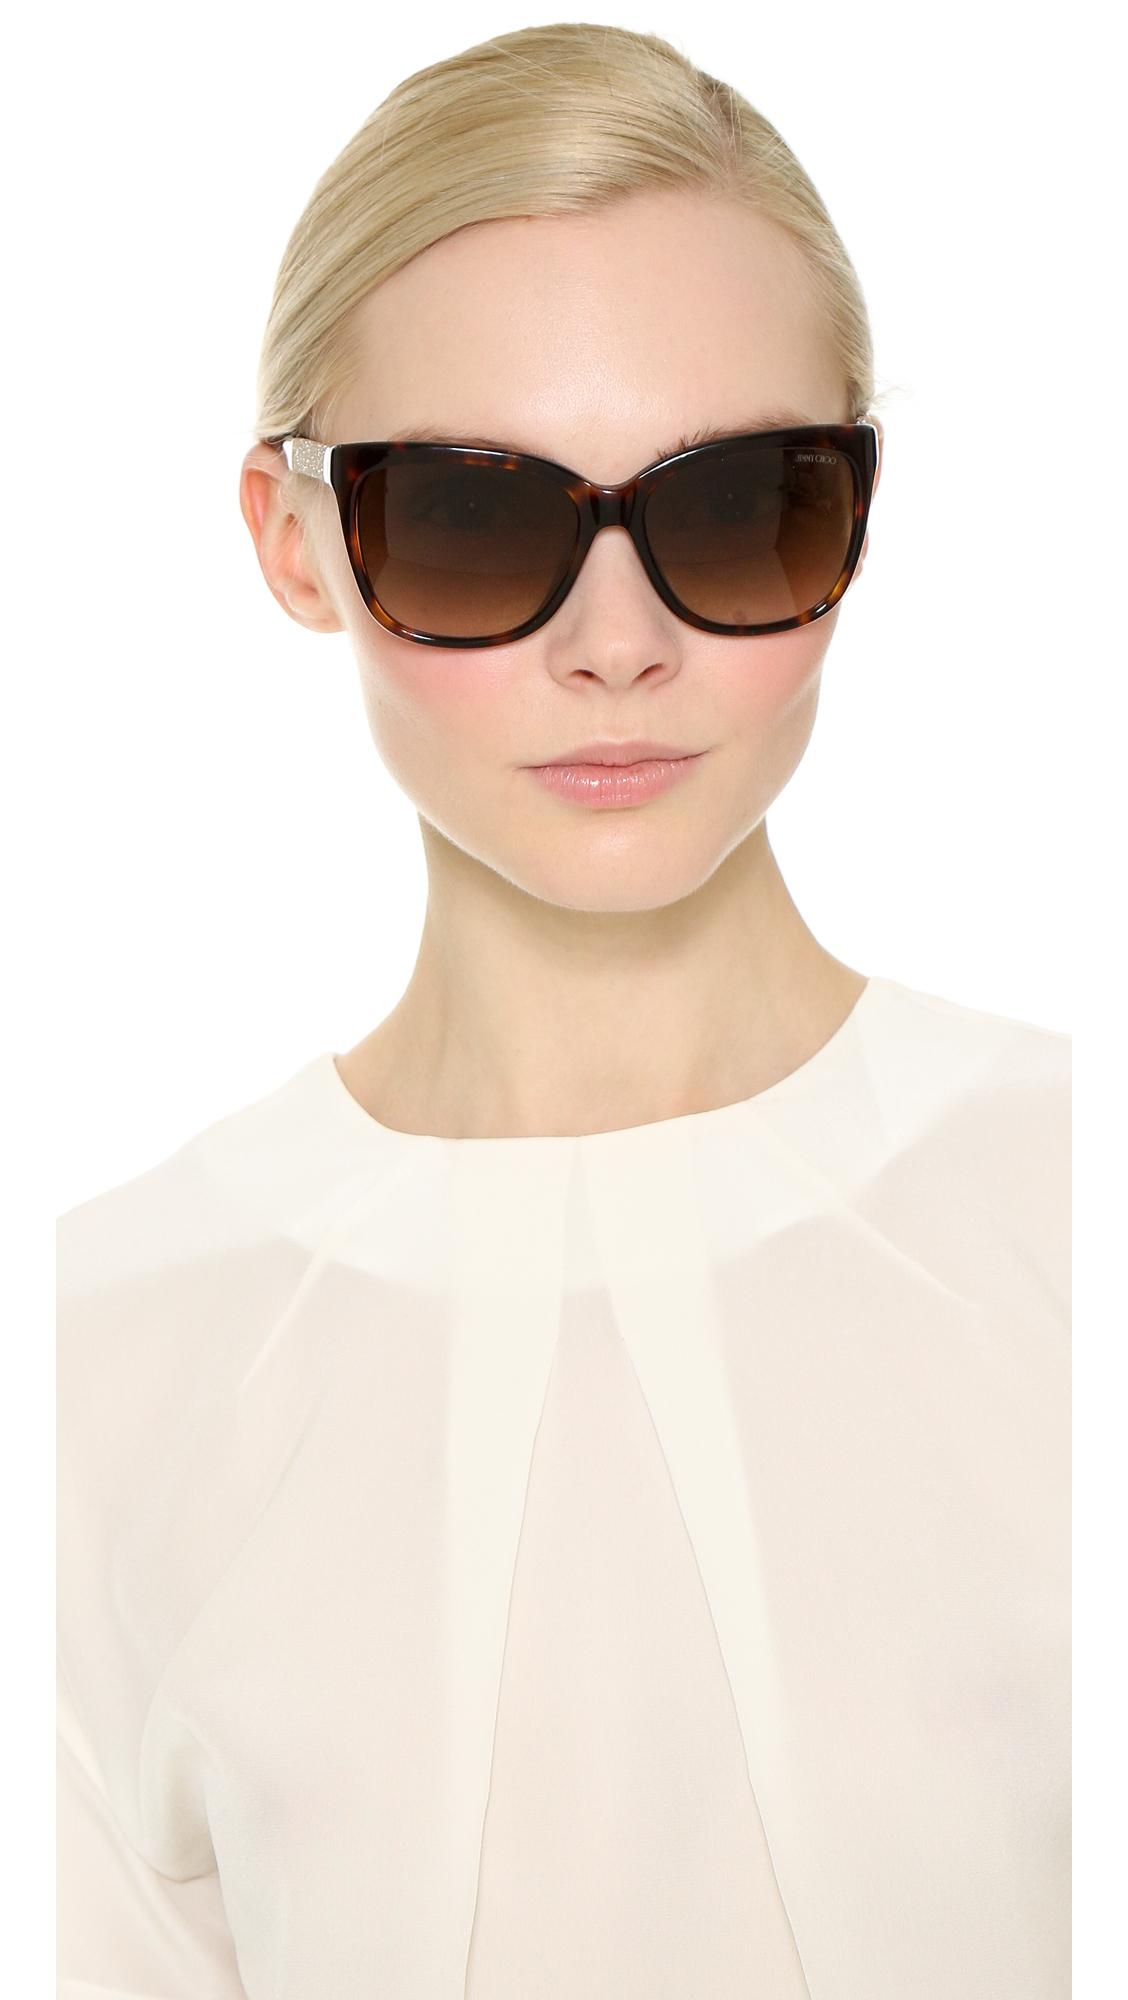 70e52c3145f Lyst - Jimmy Choo Cora Sunglasses in Brown